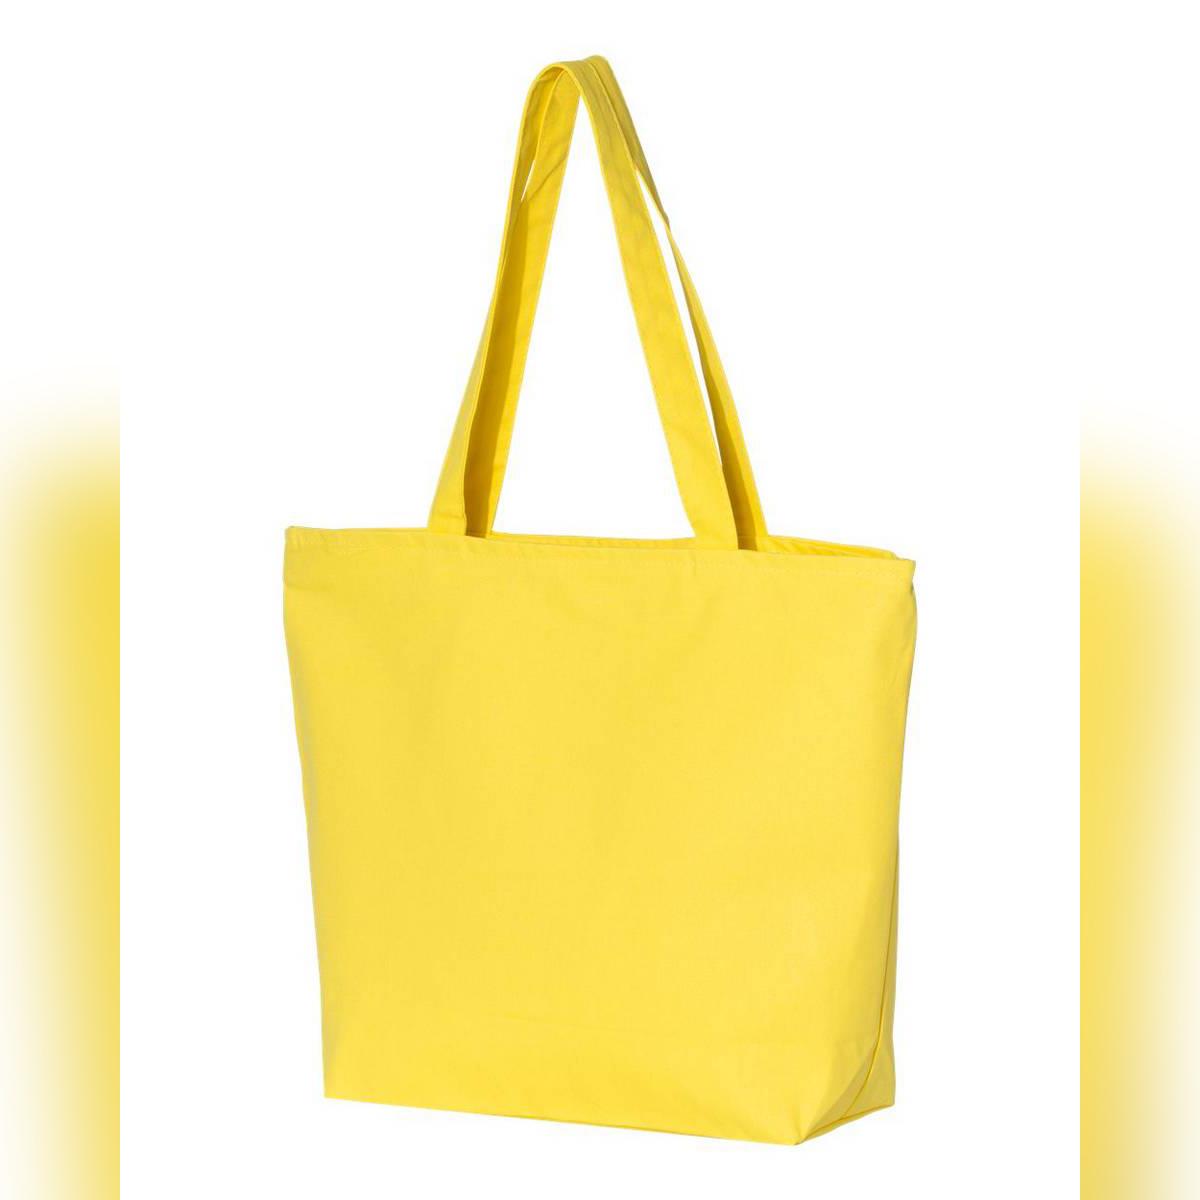 Women Durable Canvas Zipper Tote Bag Large Capacity Handbag Casual Shoulder Shopper - BLACK